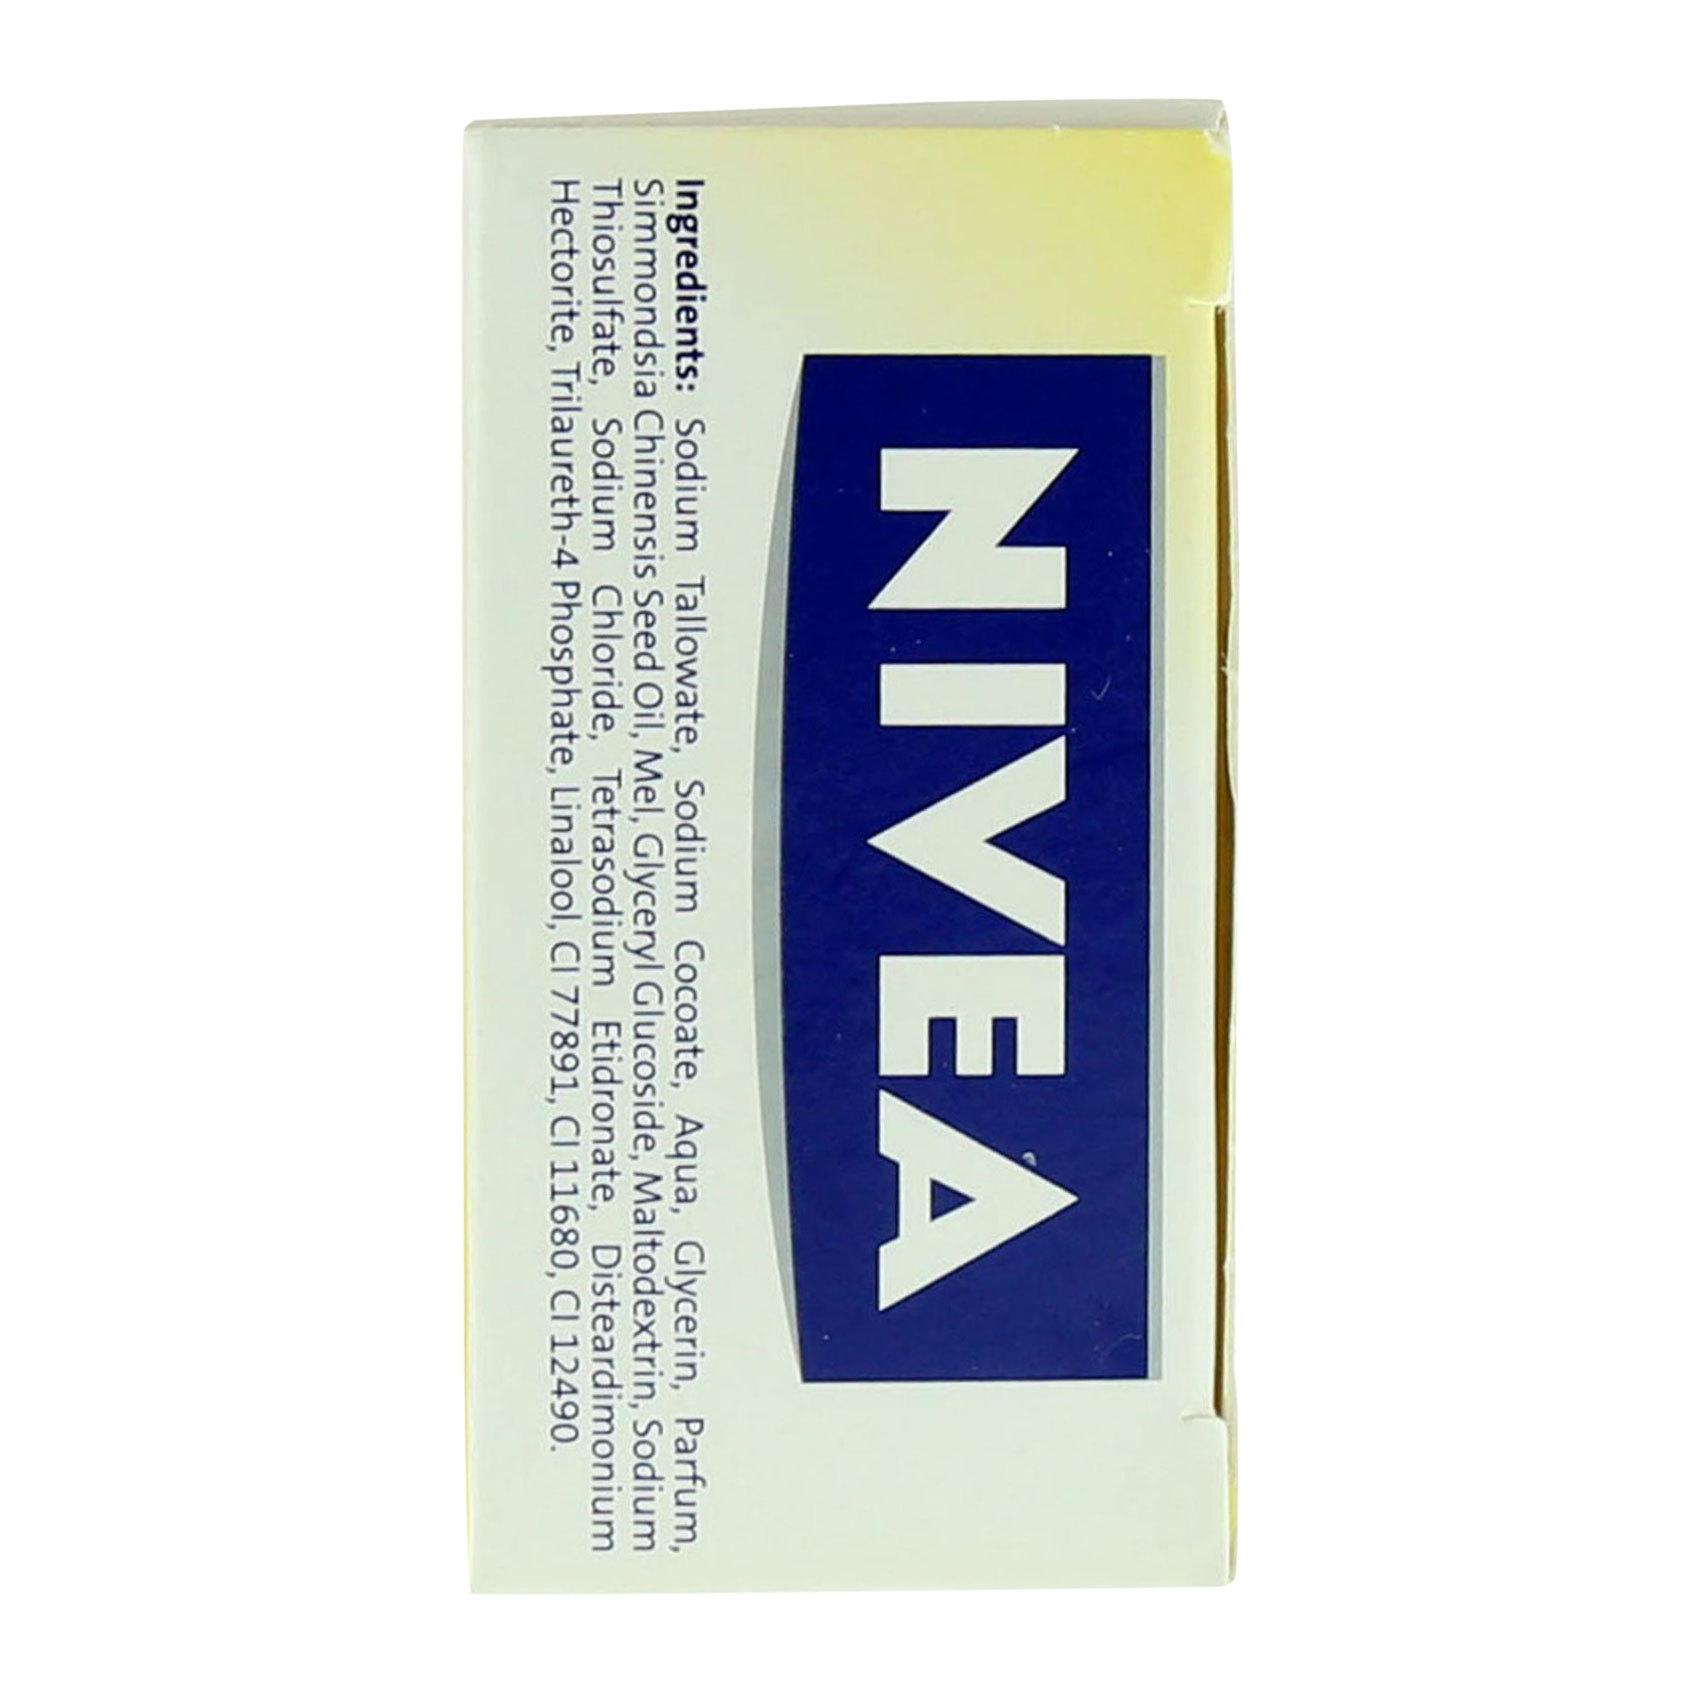 NIVEA SOAP HONEY & OIL 100GMS